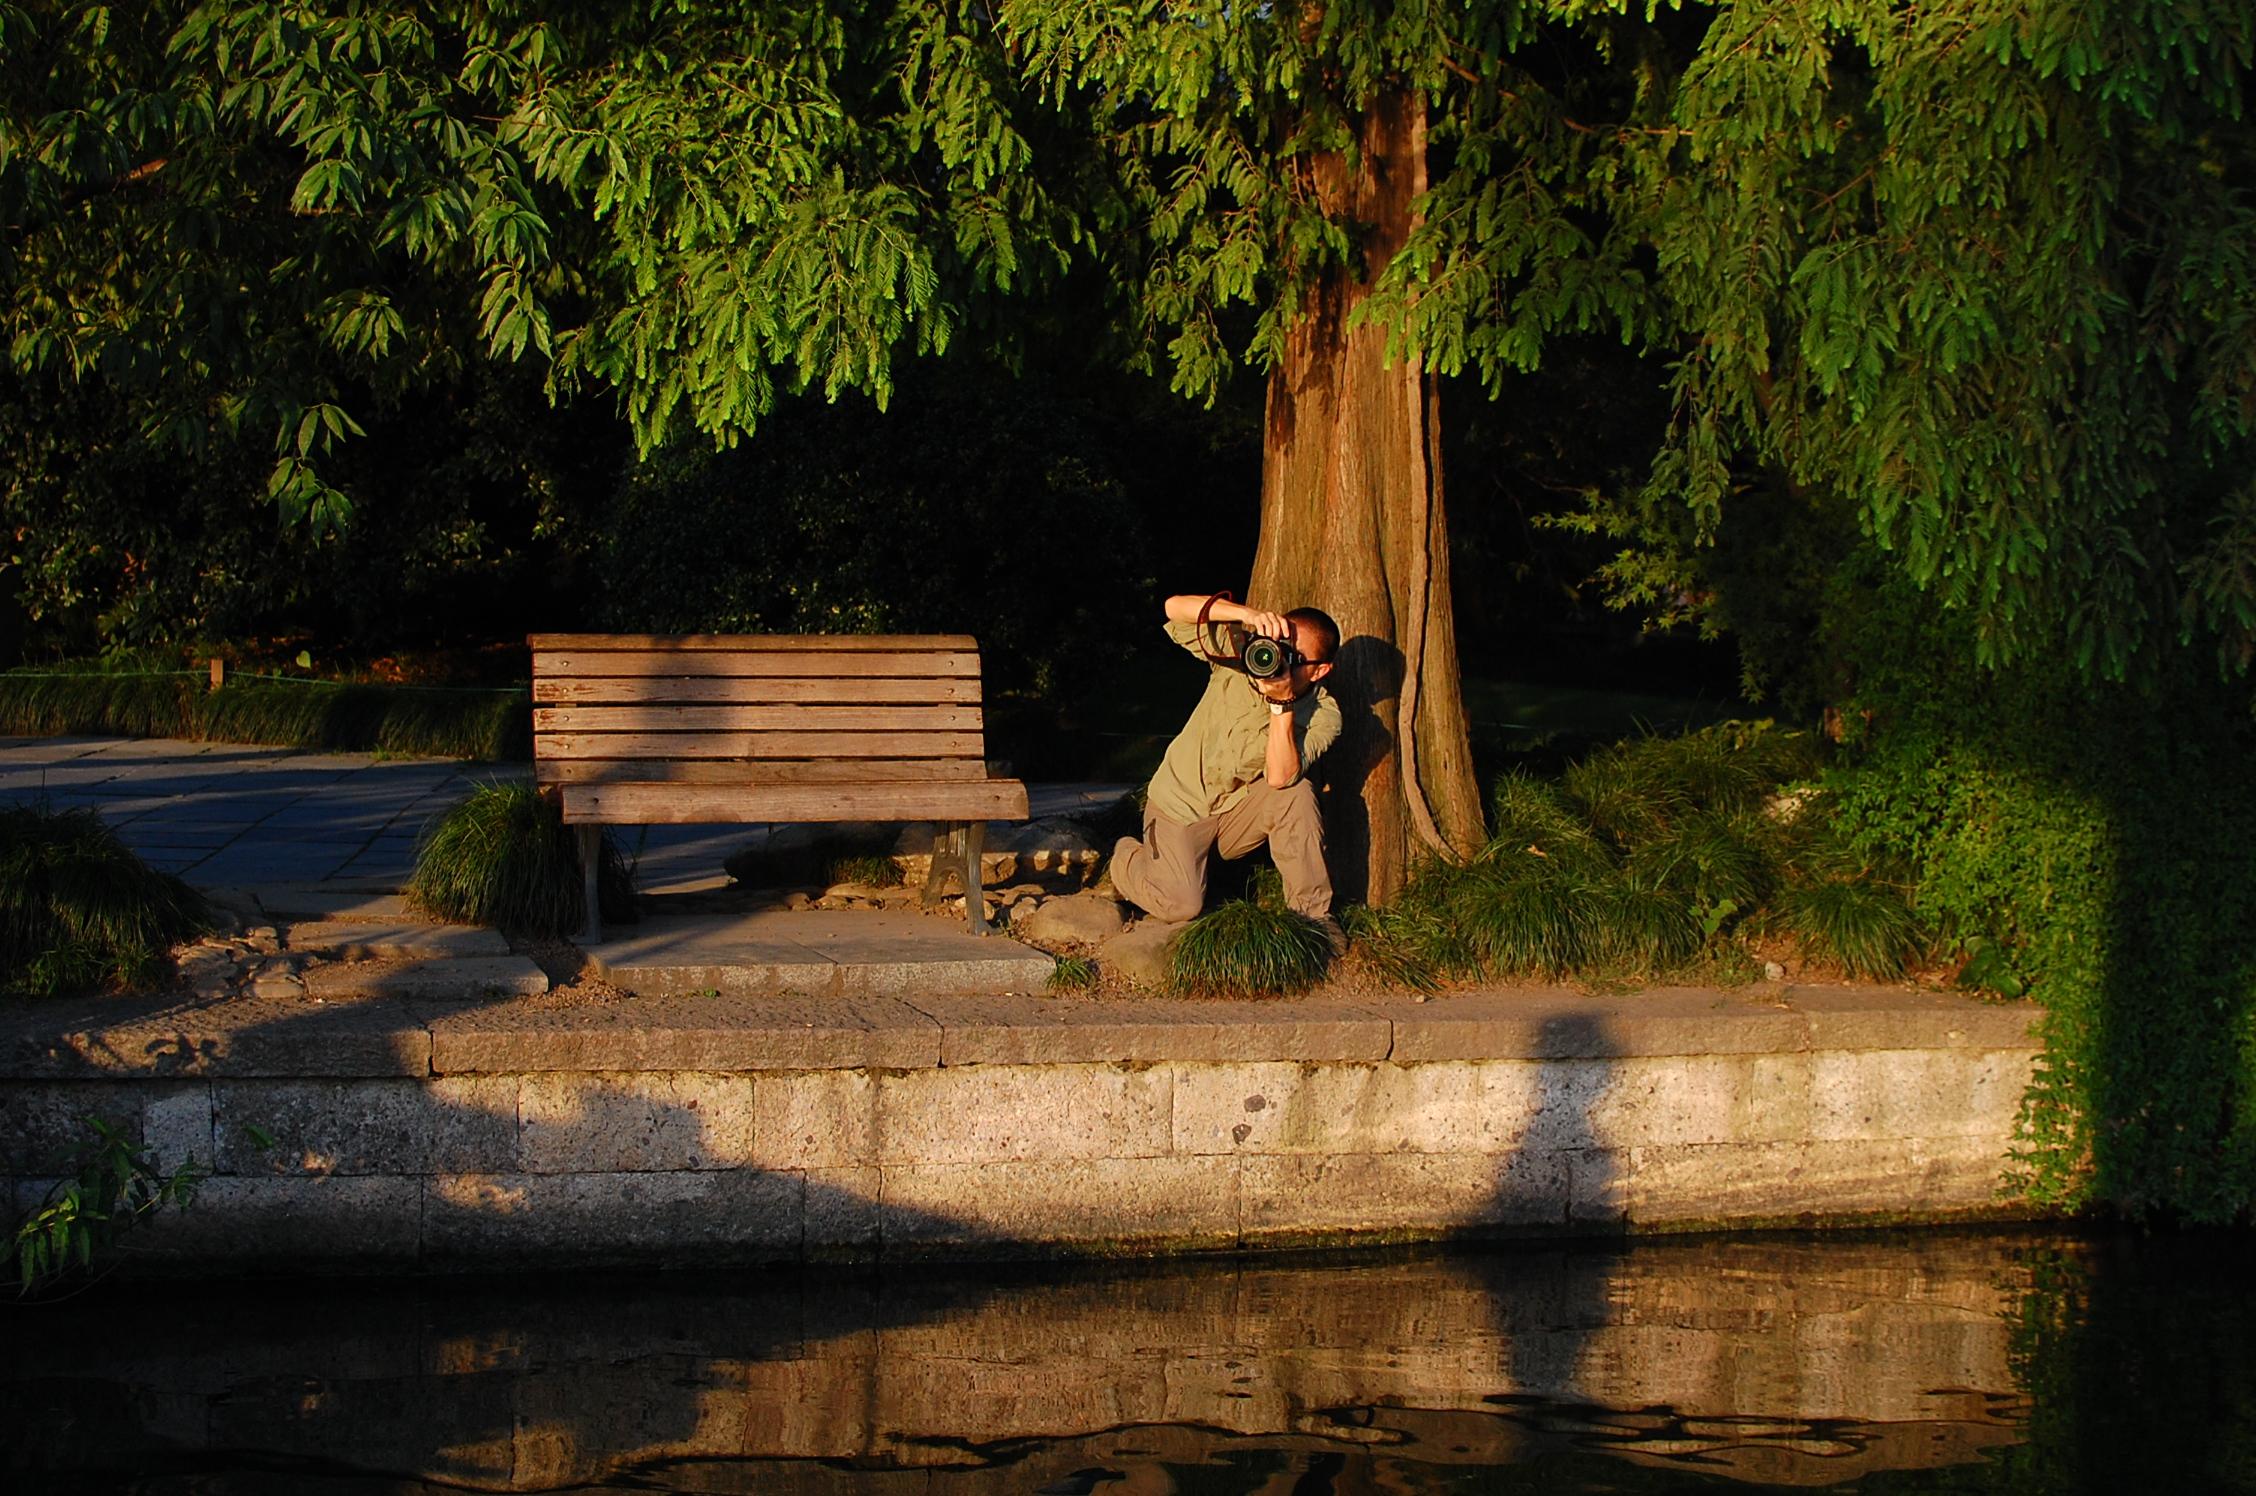 Photographer under a tree